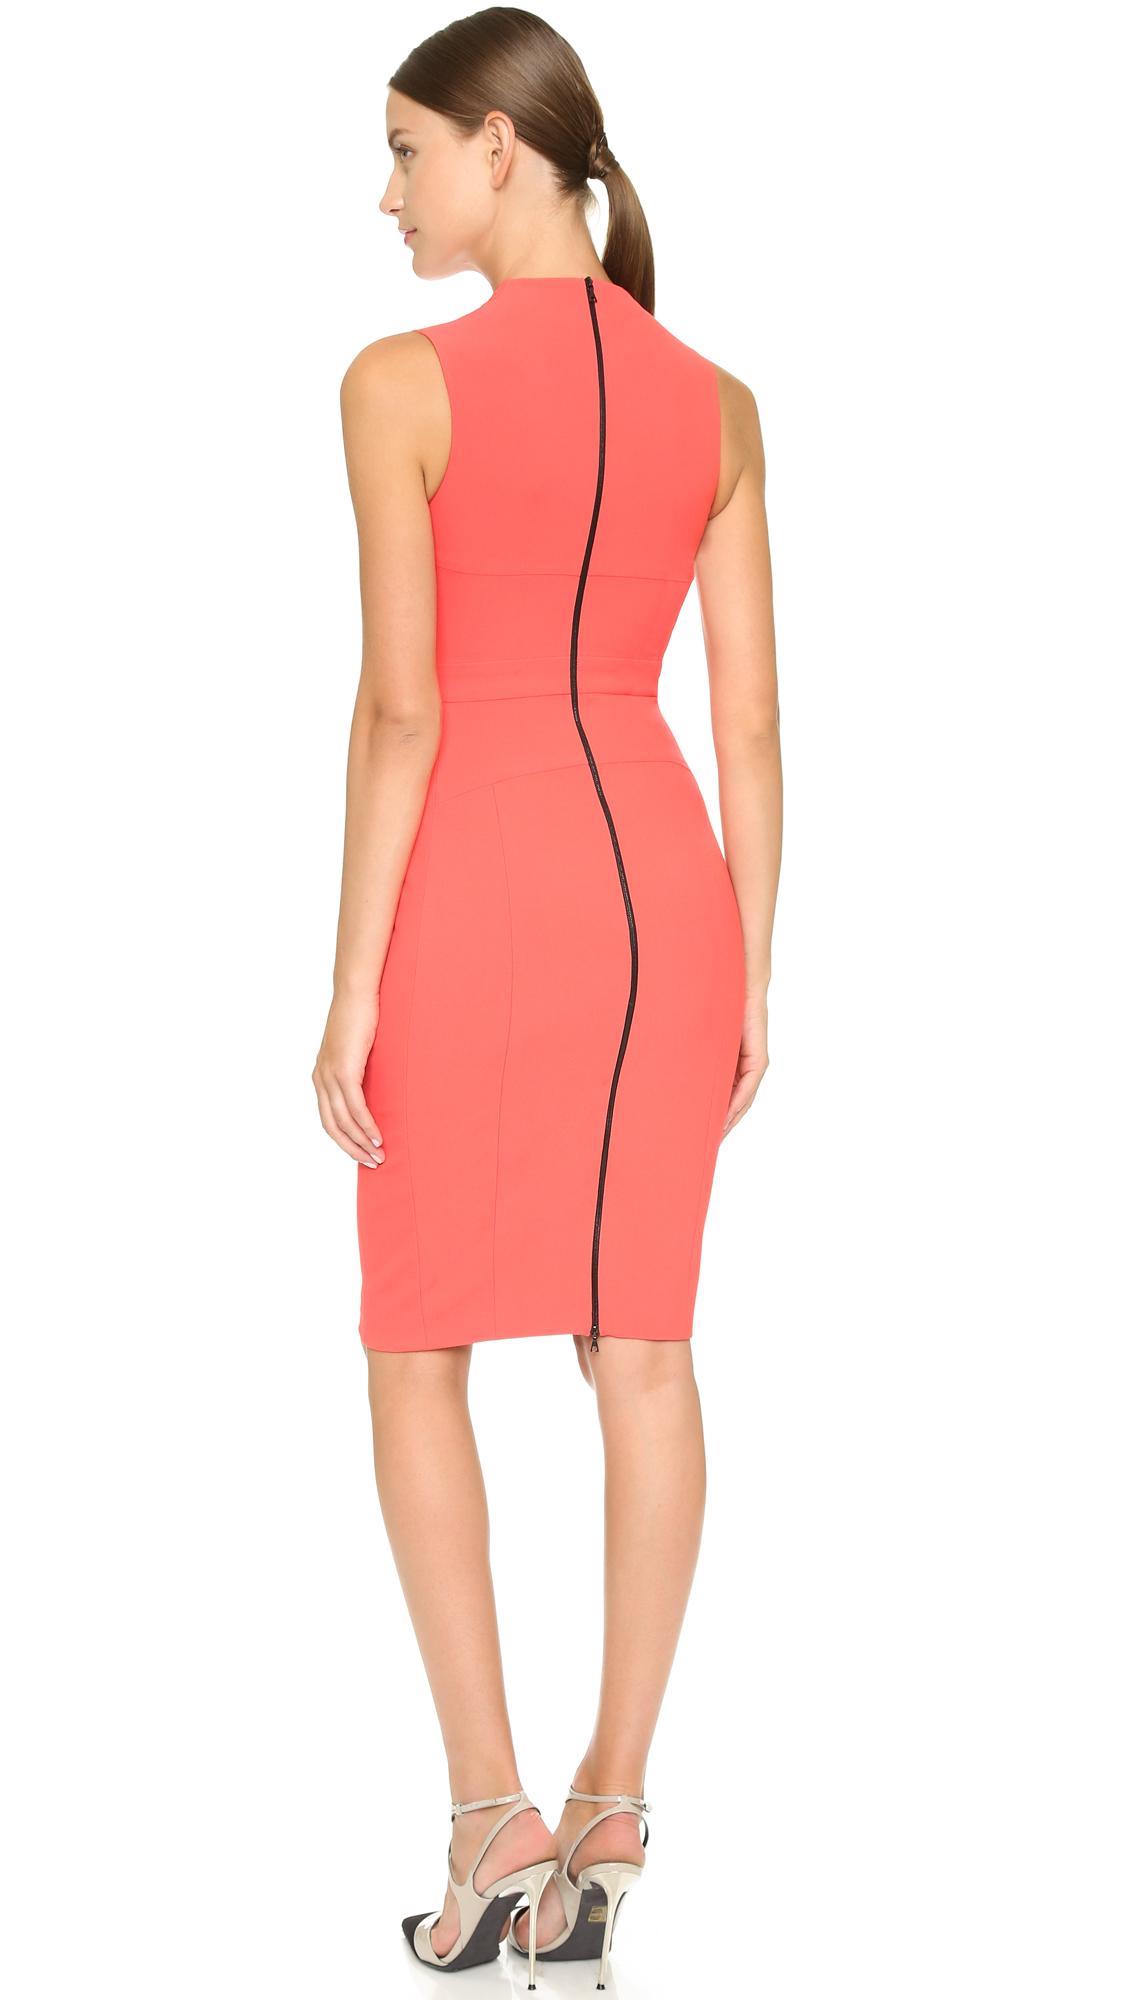 e148dc3e9ec Narciso Rodriguez Scuba Crepe Fitted Dress - Red in Orange - Lyst